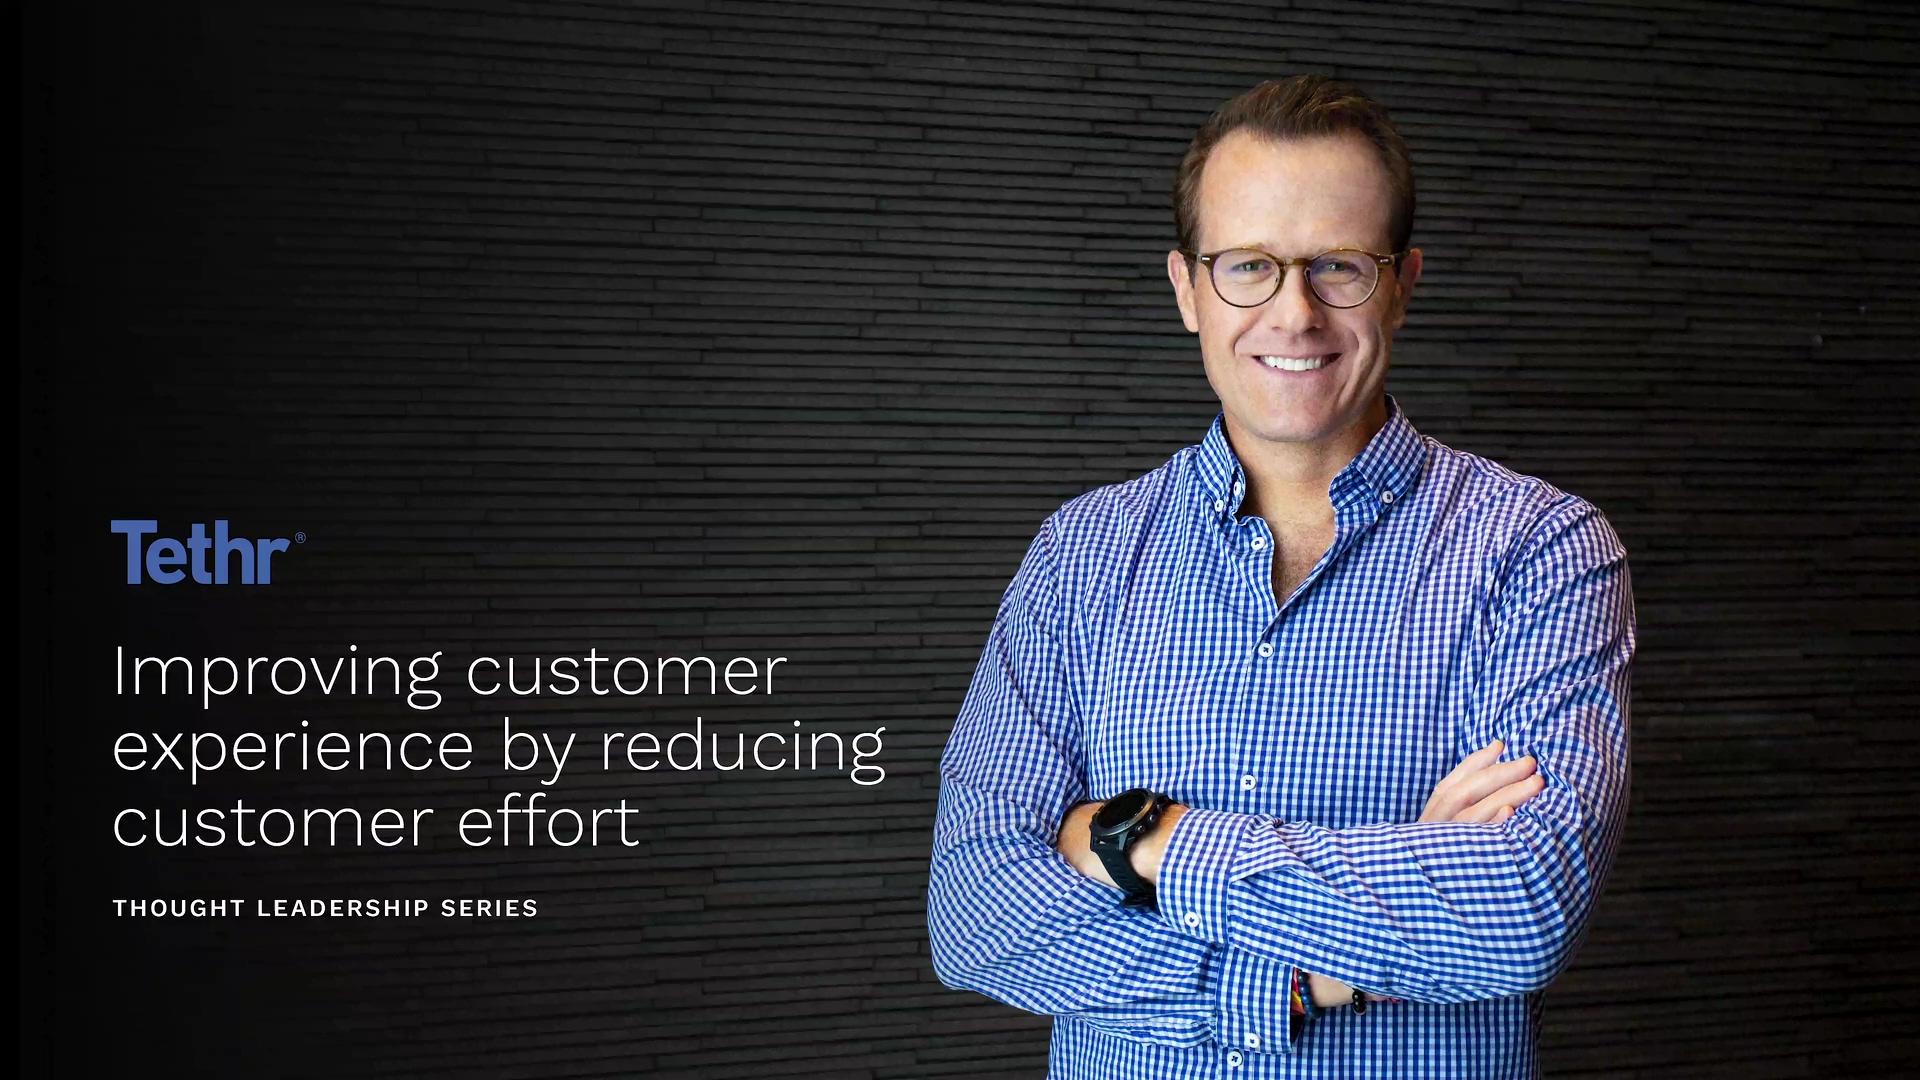 Tethr - Improving customer experience by reducing customer effort (1)